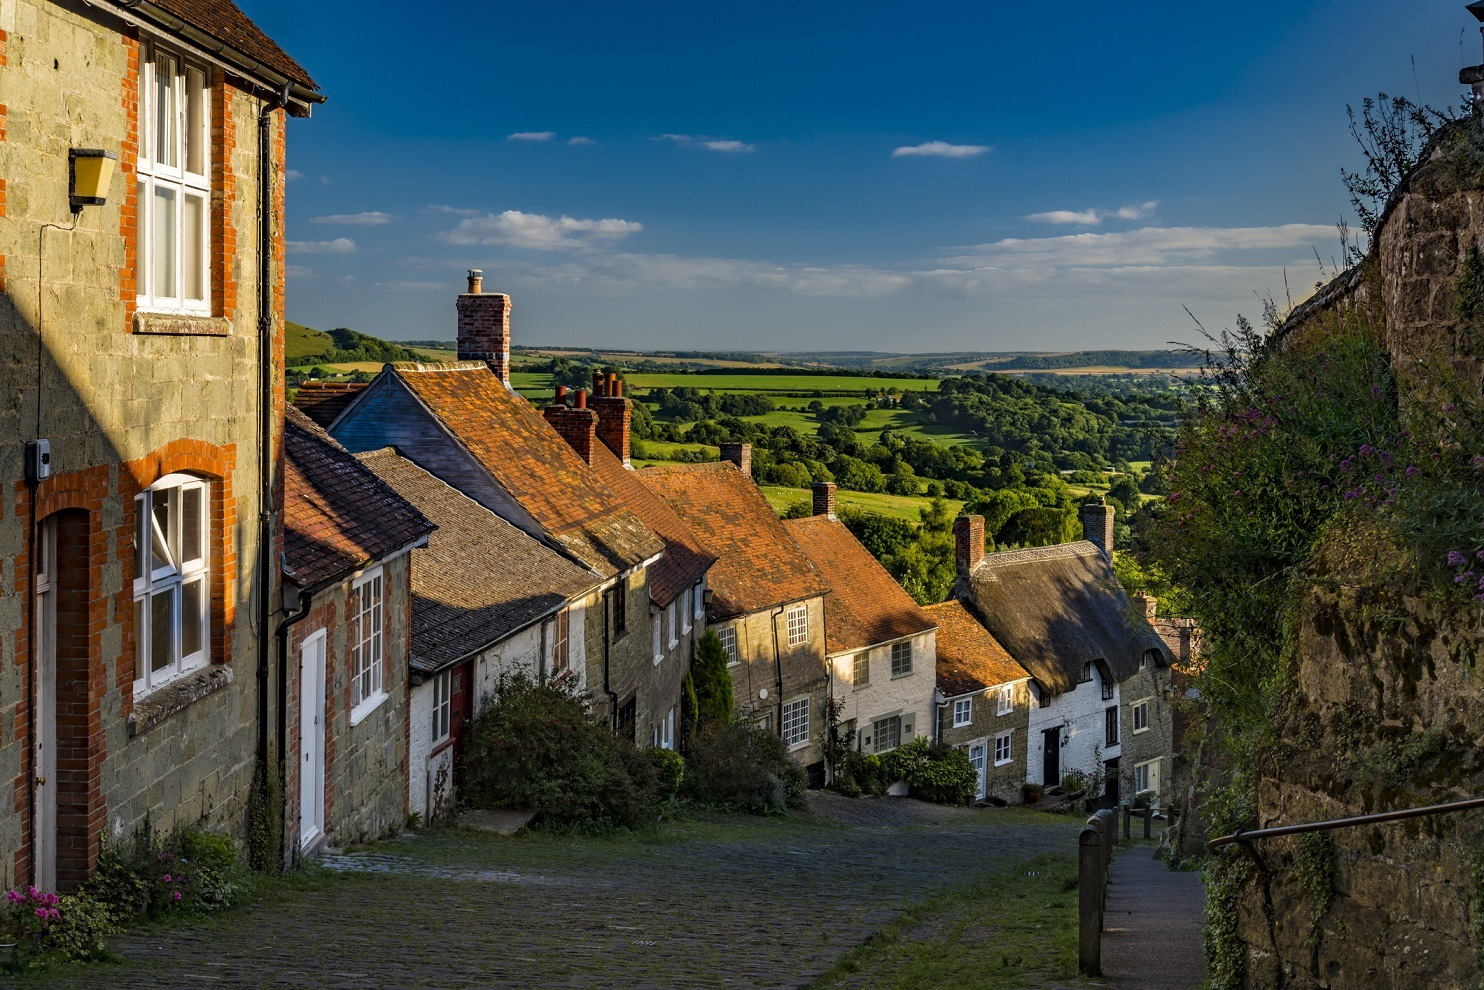 Shafetsbury, Dorset, England